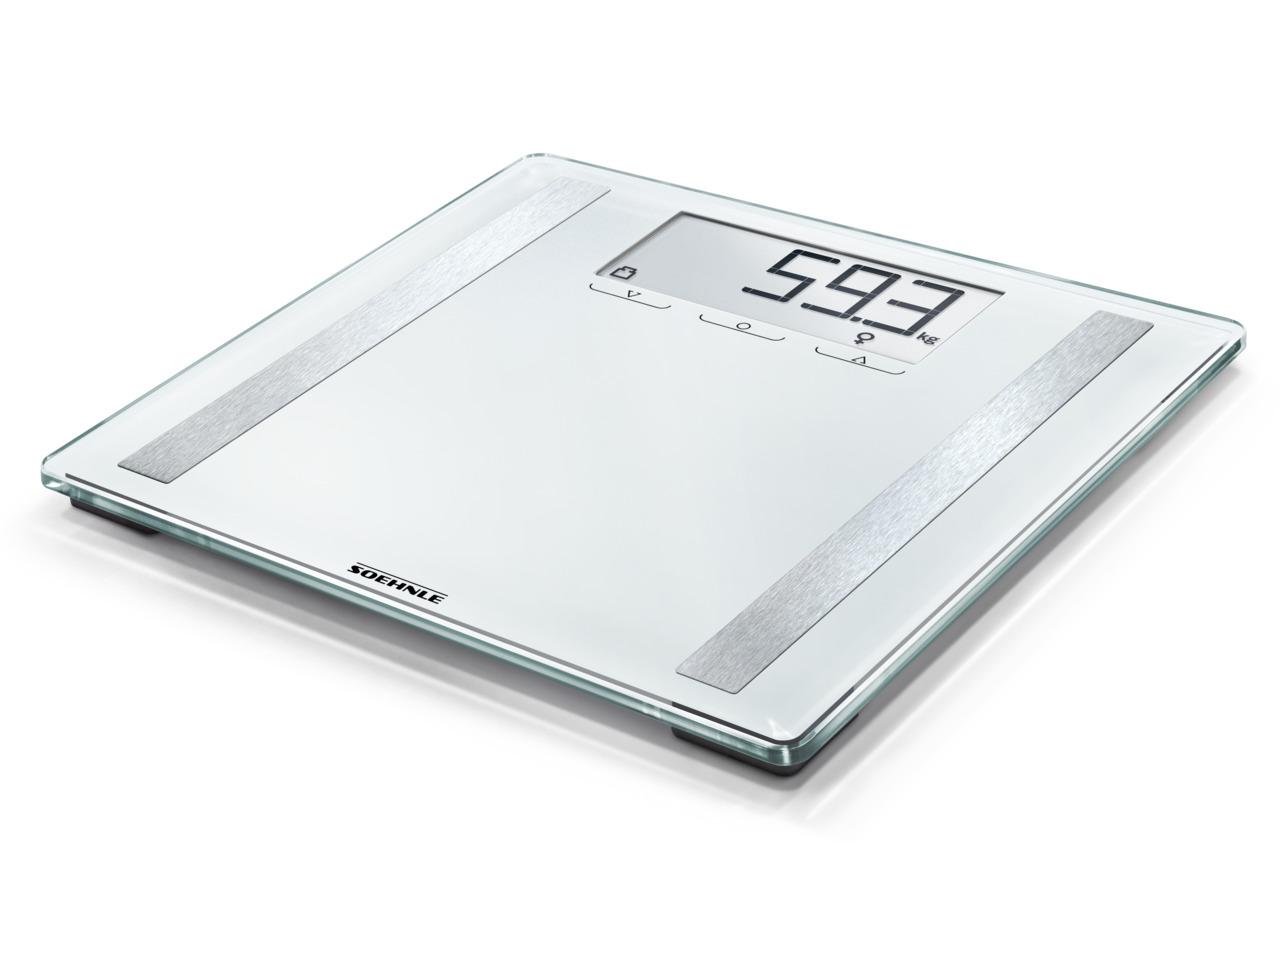 Soehnle Shape Sense Control 200 osobní váha - digitální SOEHNLE 63858